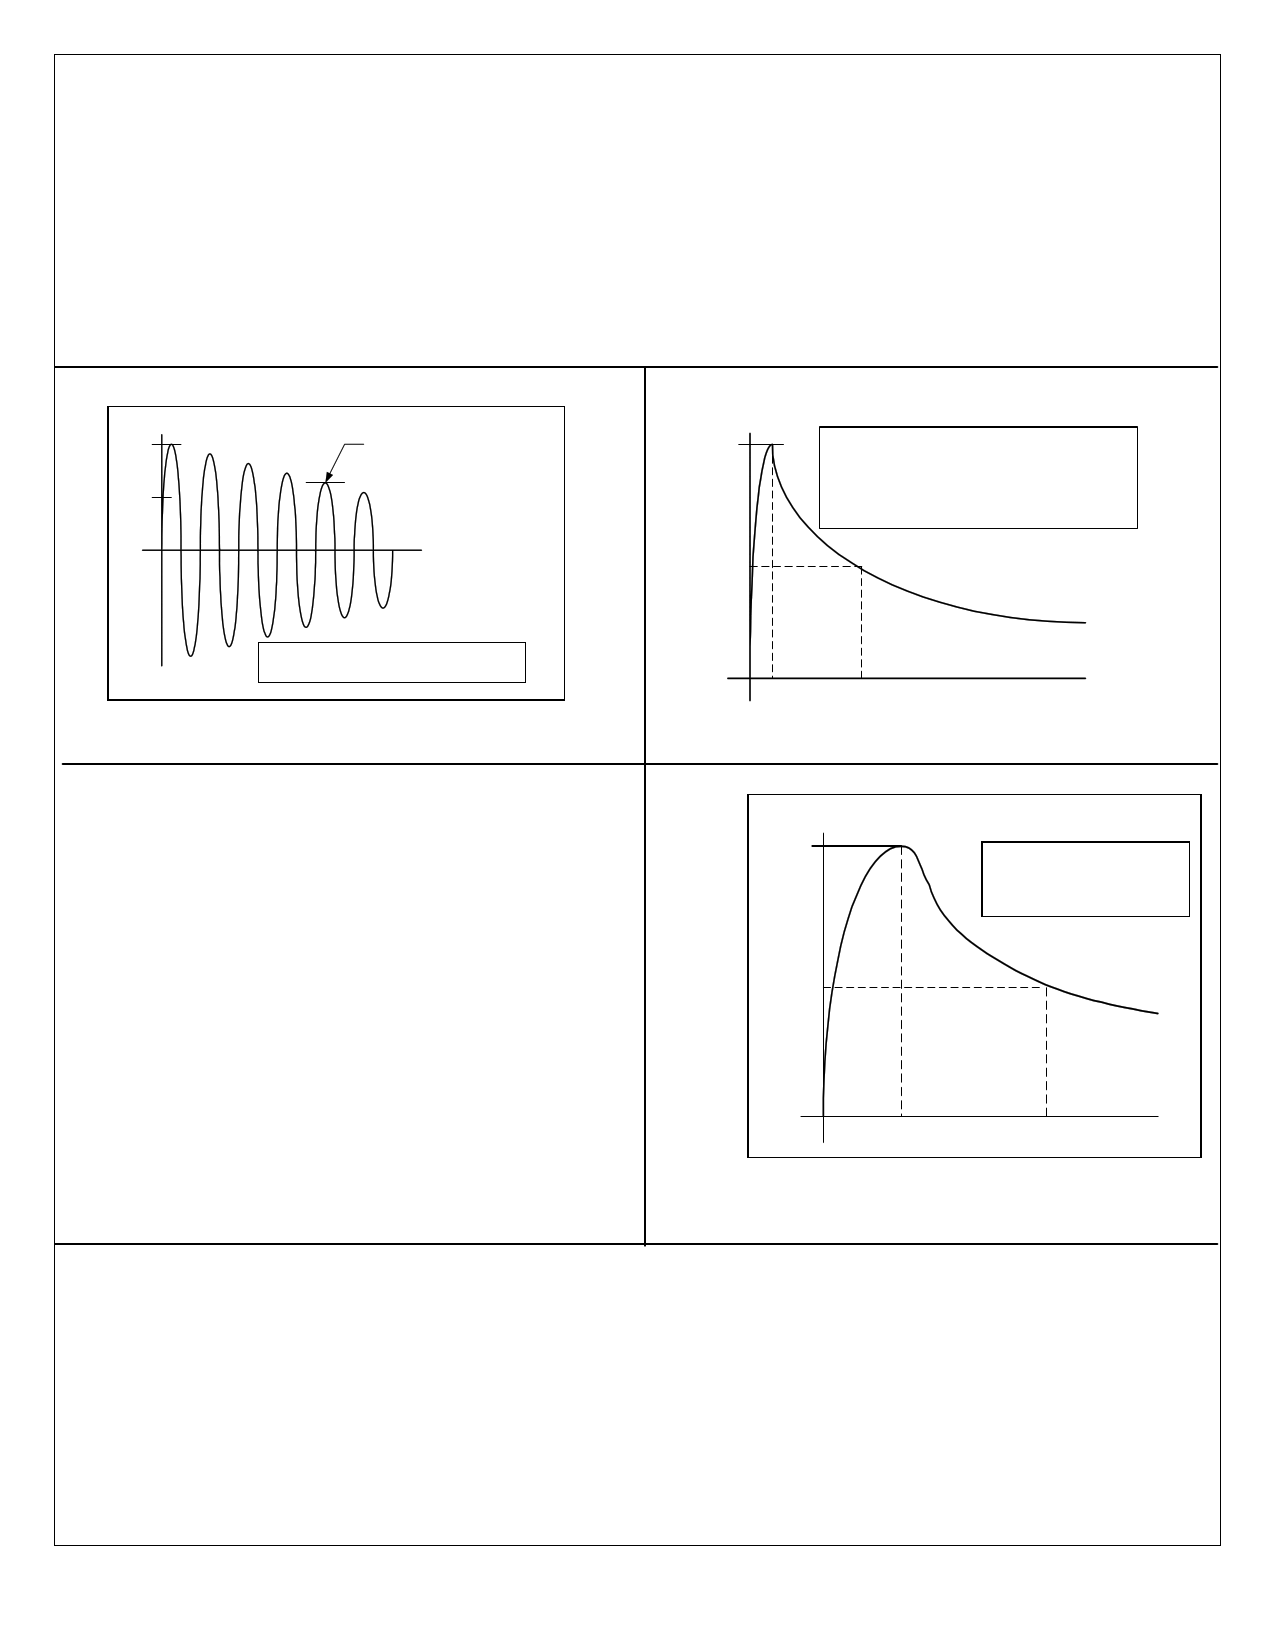 DEI1188 電子部品, 半導体